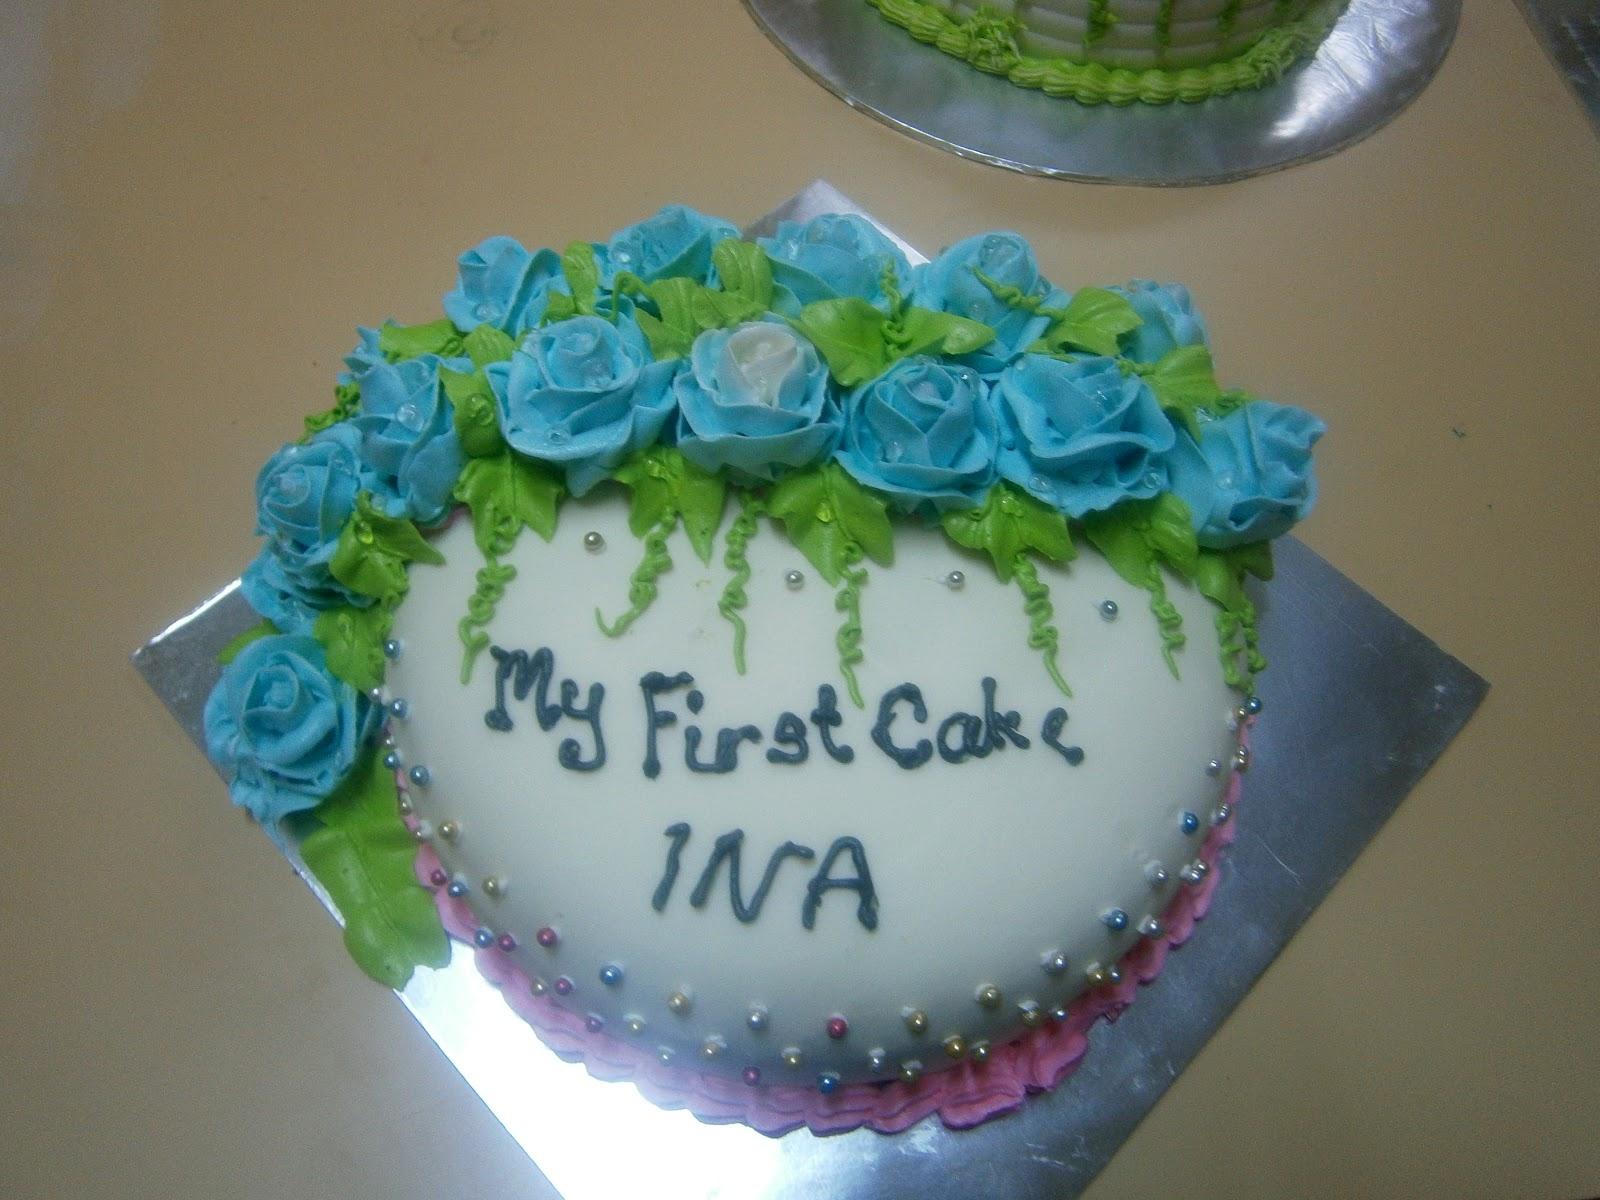 Shyieda Gateaux Homemade Melaka: Cake Decorating Class